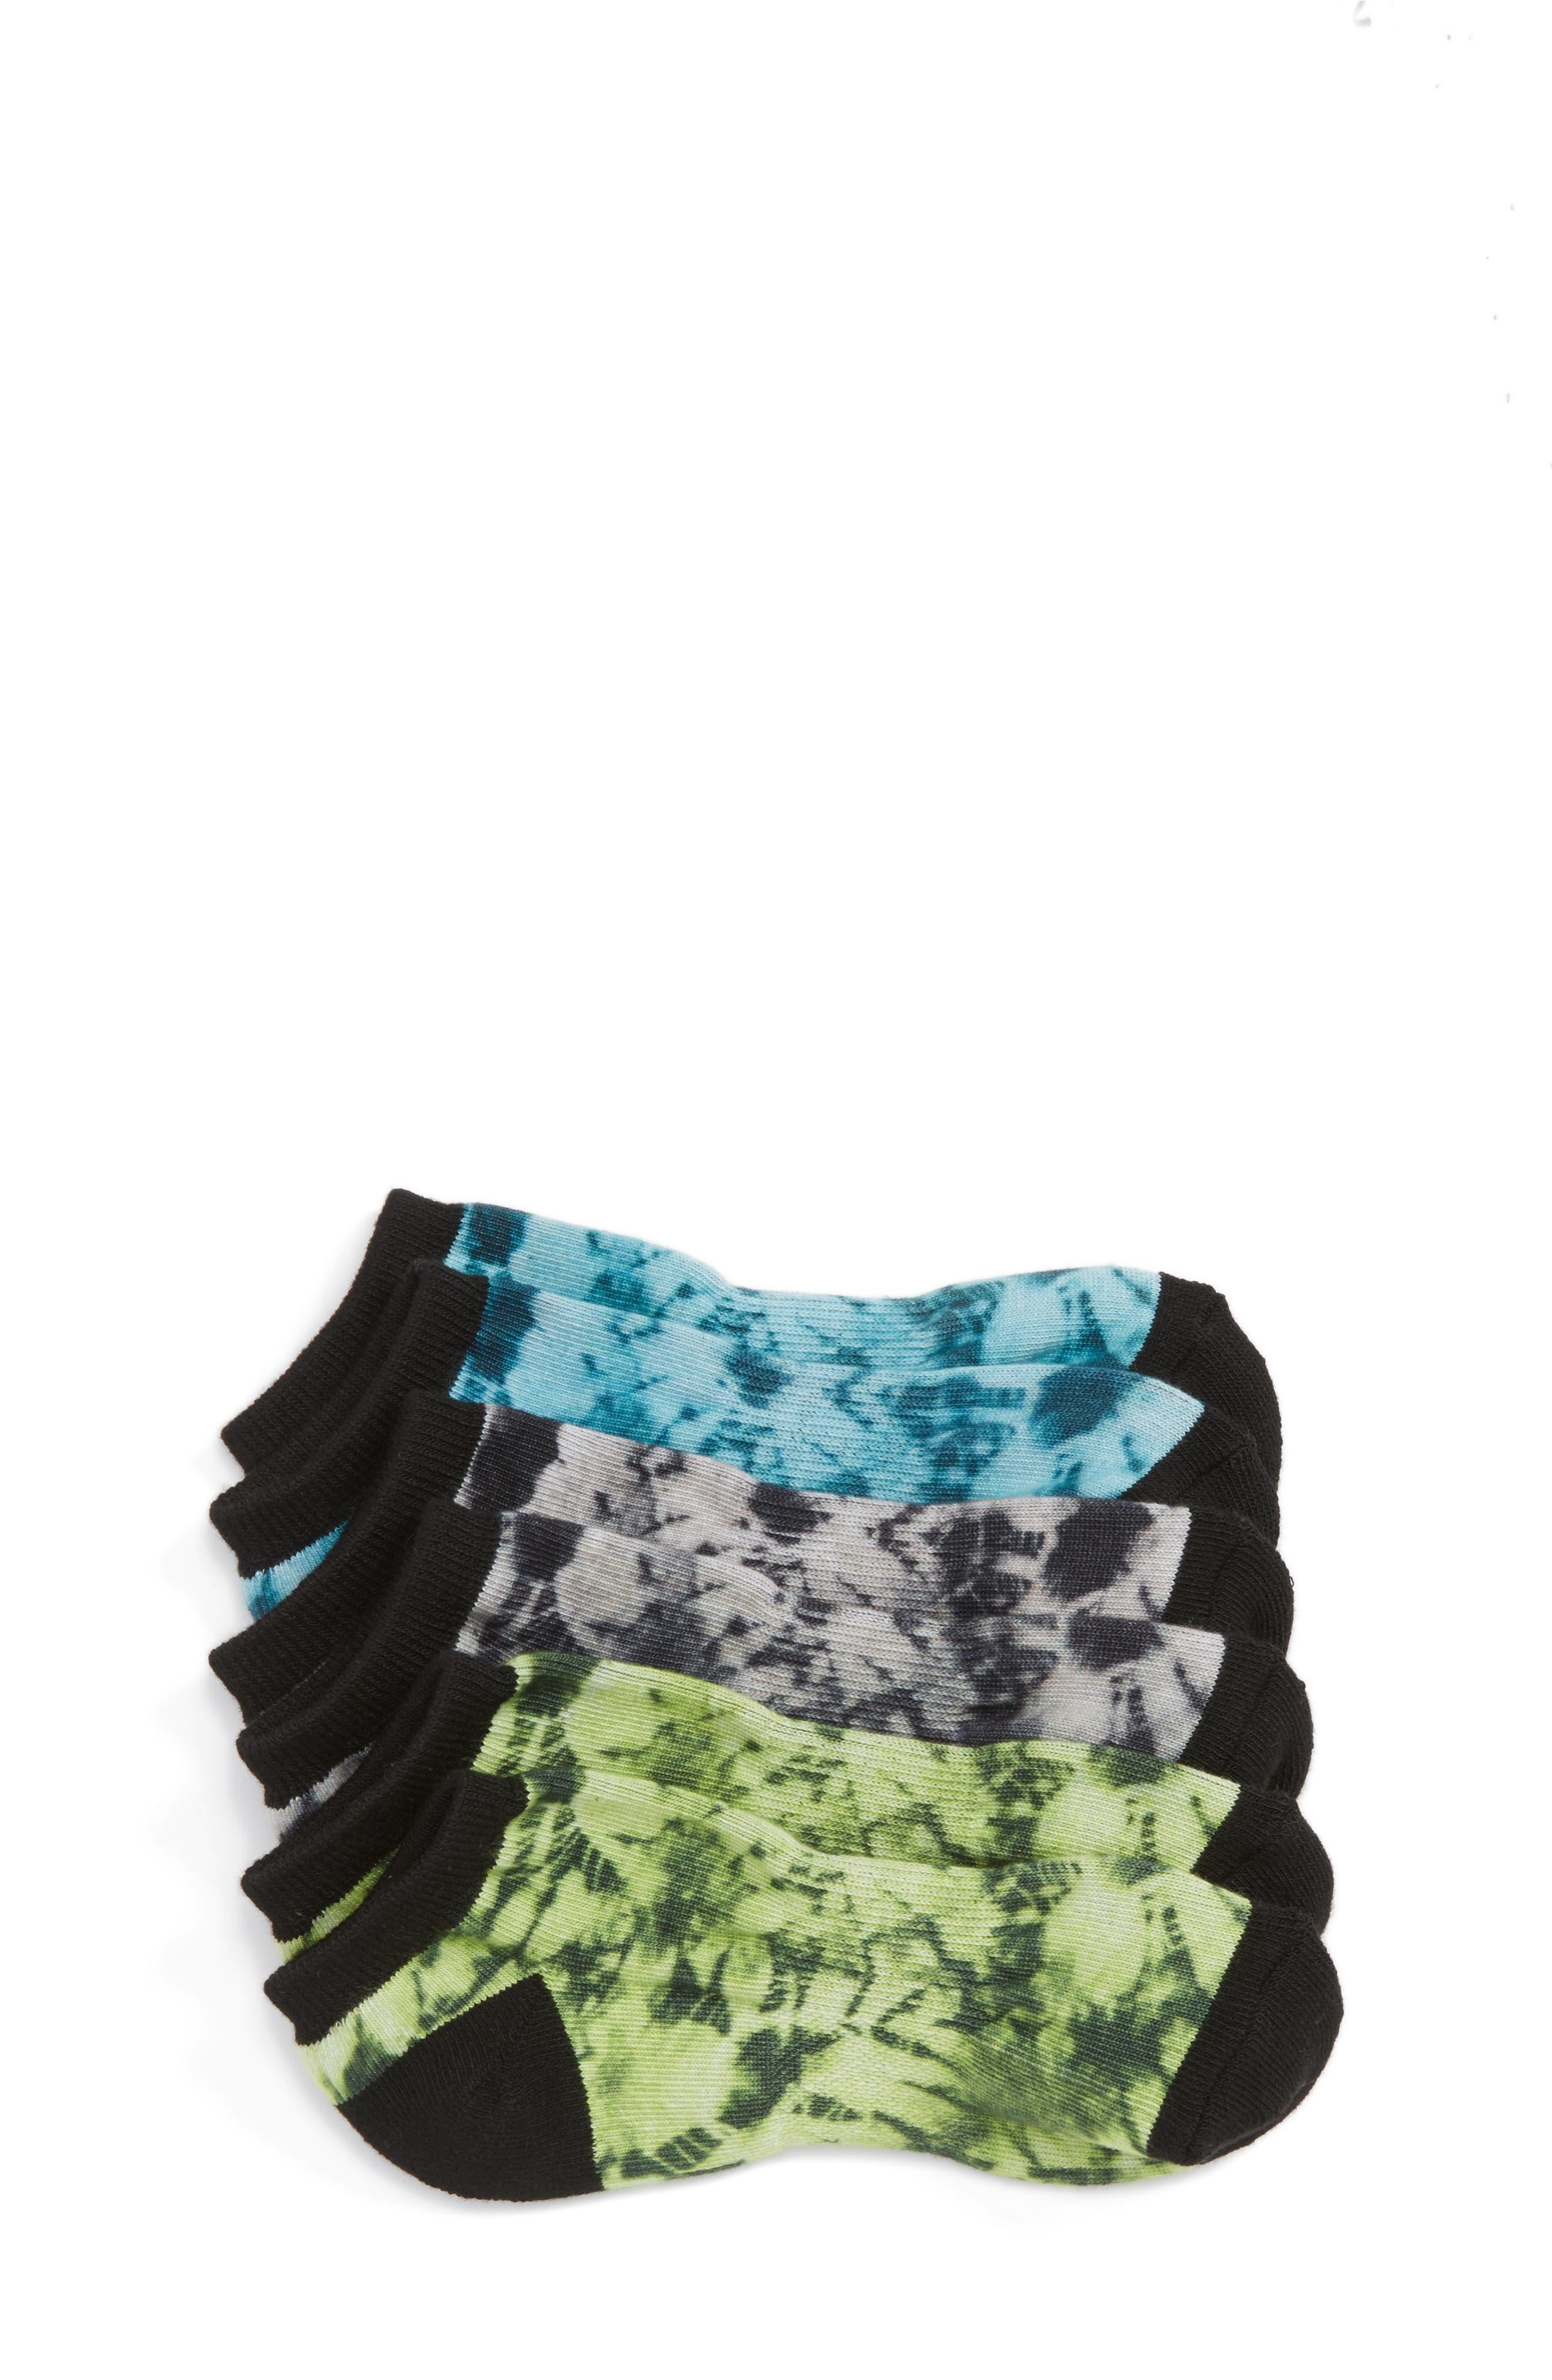 Rotary 3-Pack Lowcut Socks,                             Main thumbnail 1, color,                             001